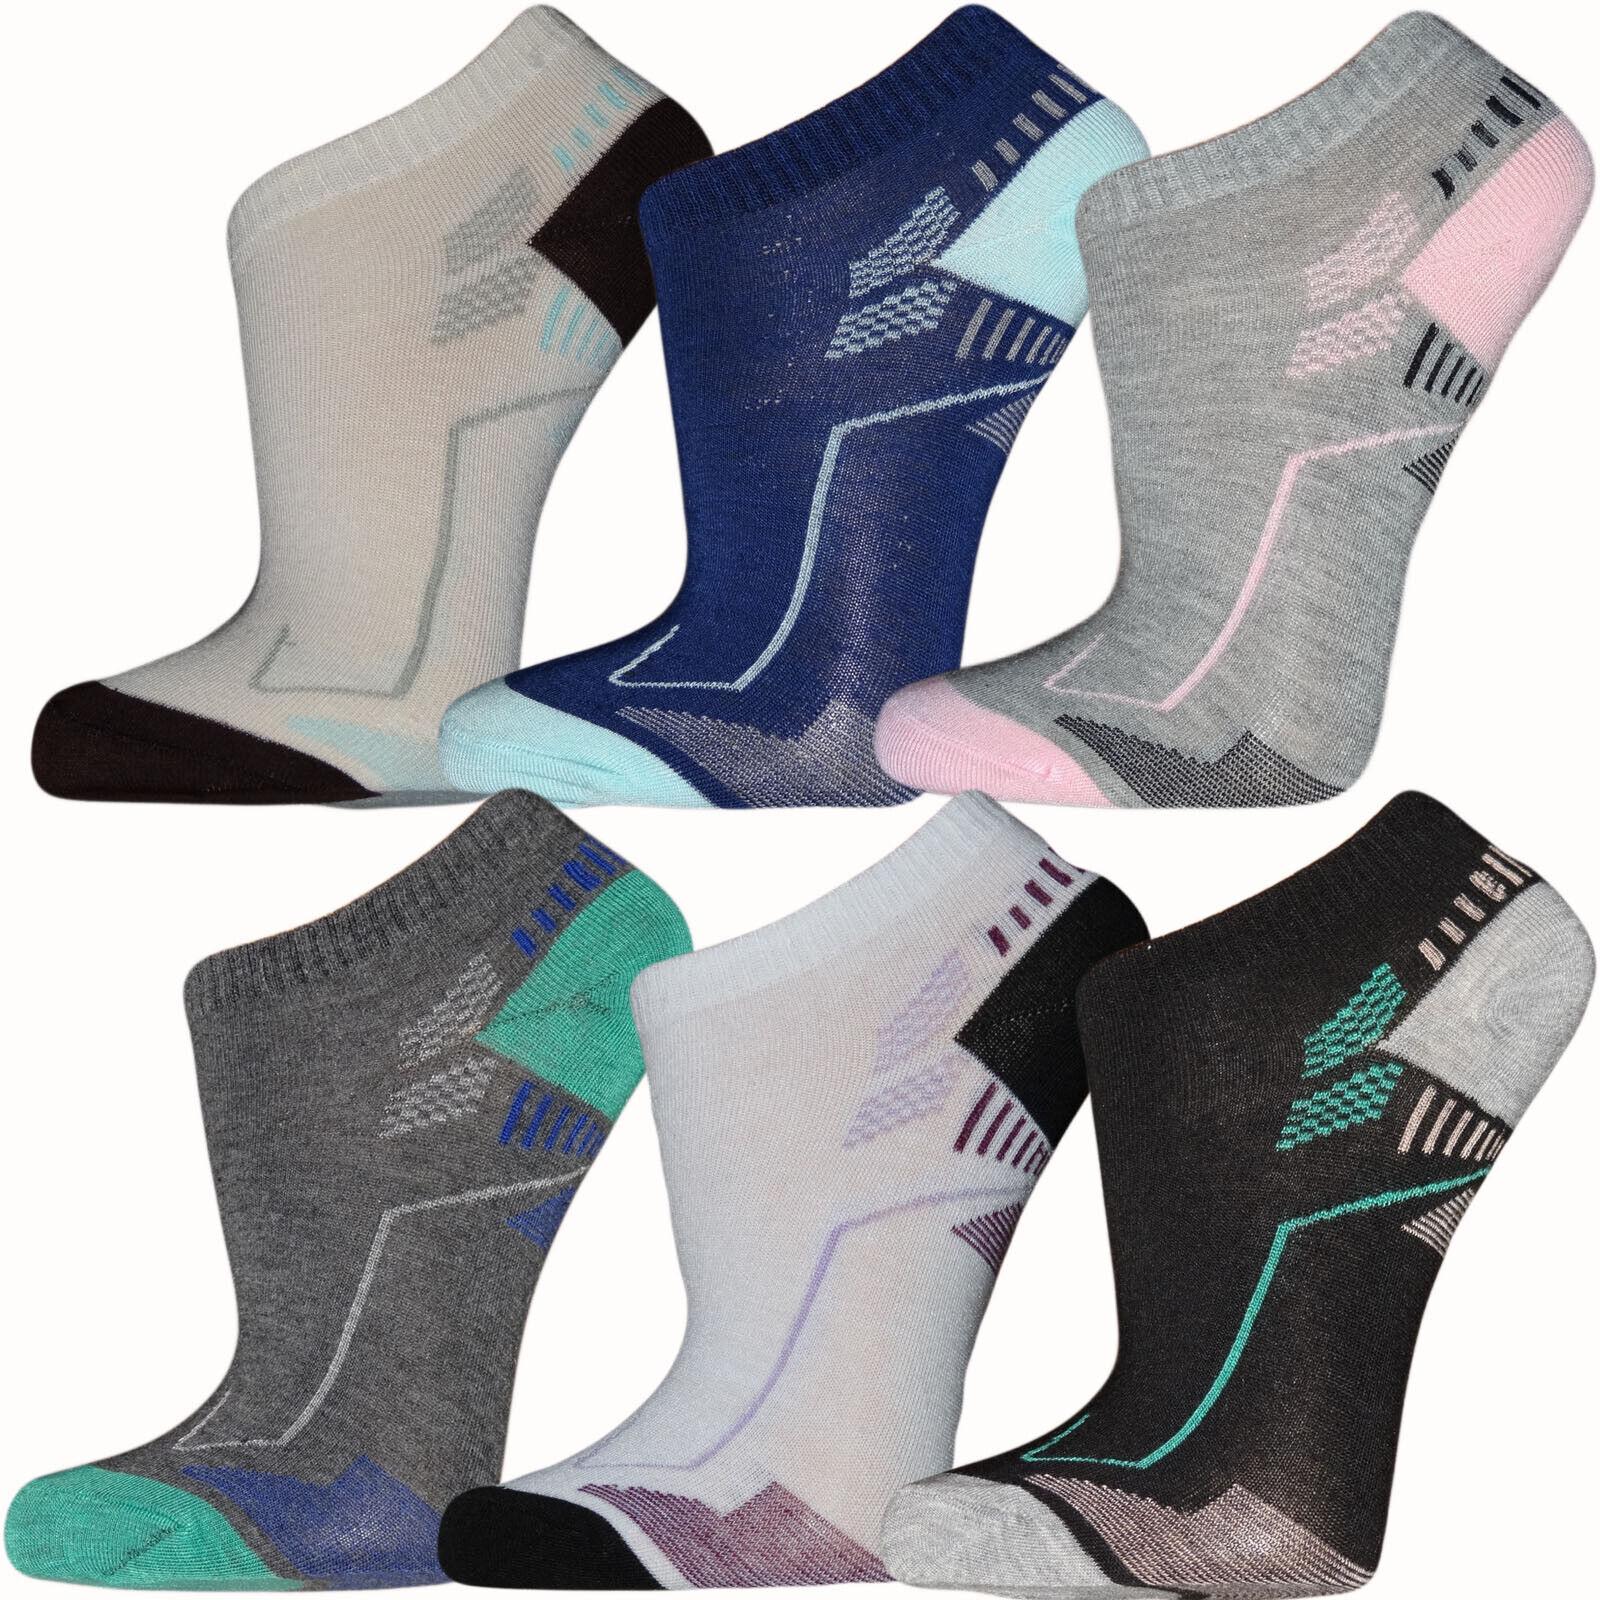 12-36 Paar Damen Socken Paket Füßlinge Sport Sneaker Söckchen Kurzsocken Mädels